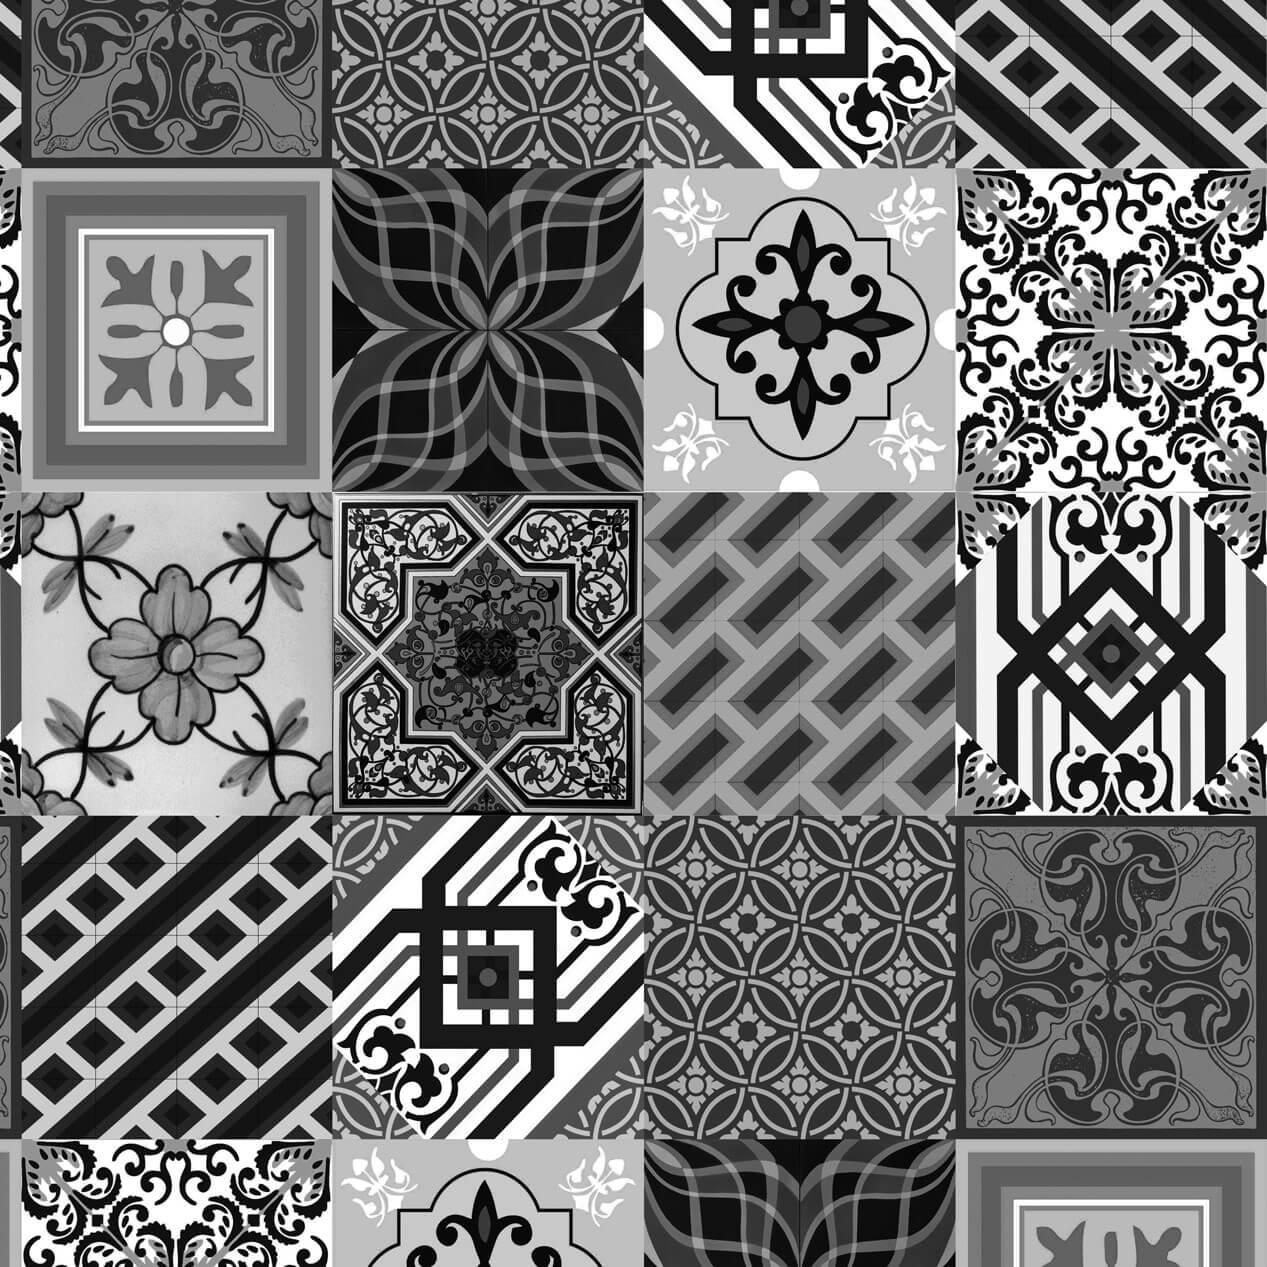 Papel de Parede Adesivo Azulejo Retrô Preto e Branco